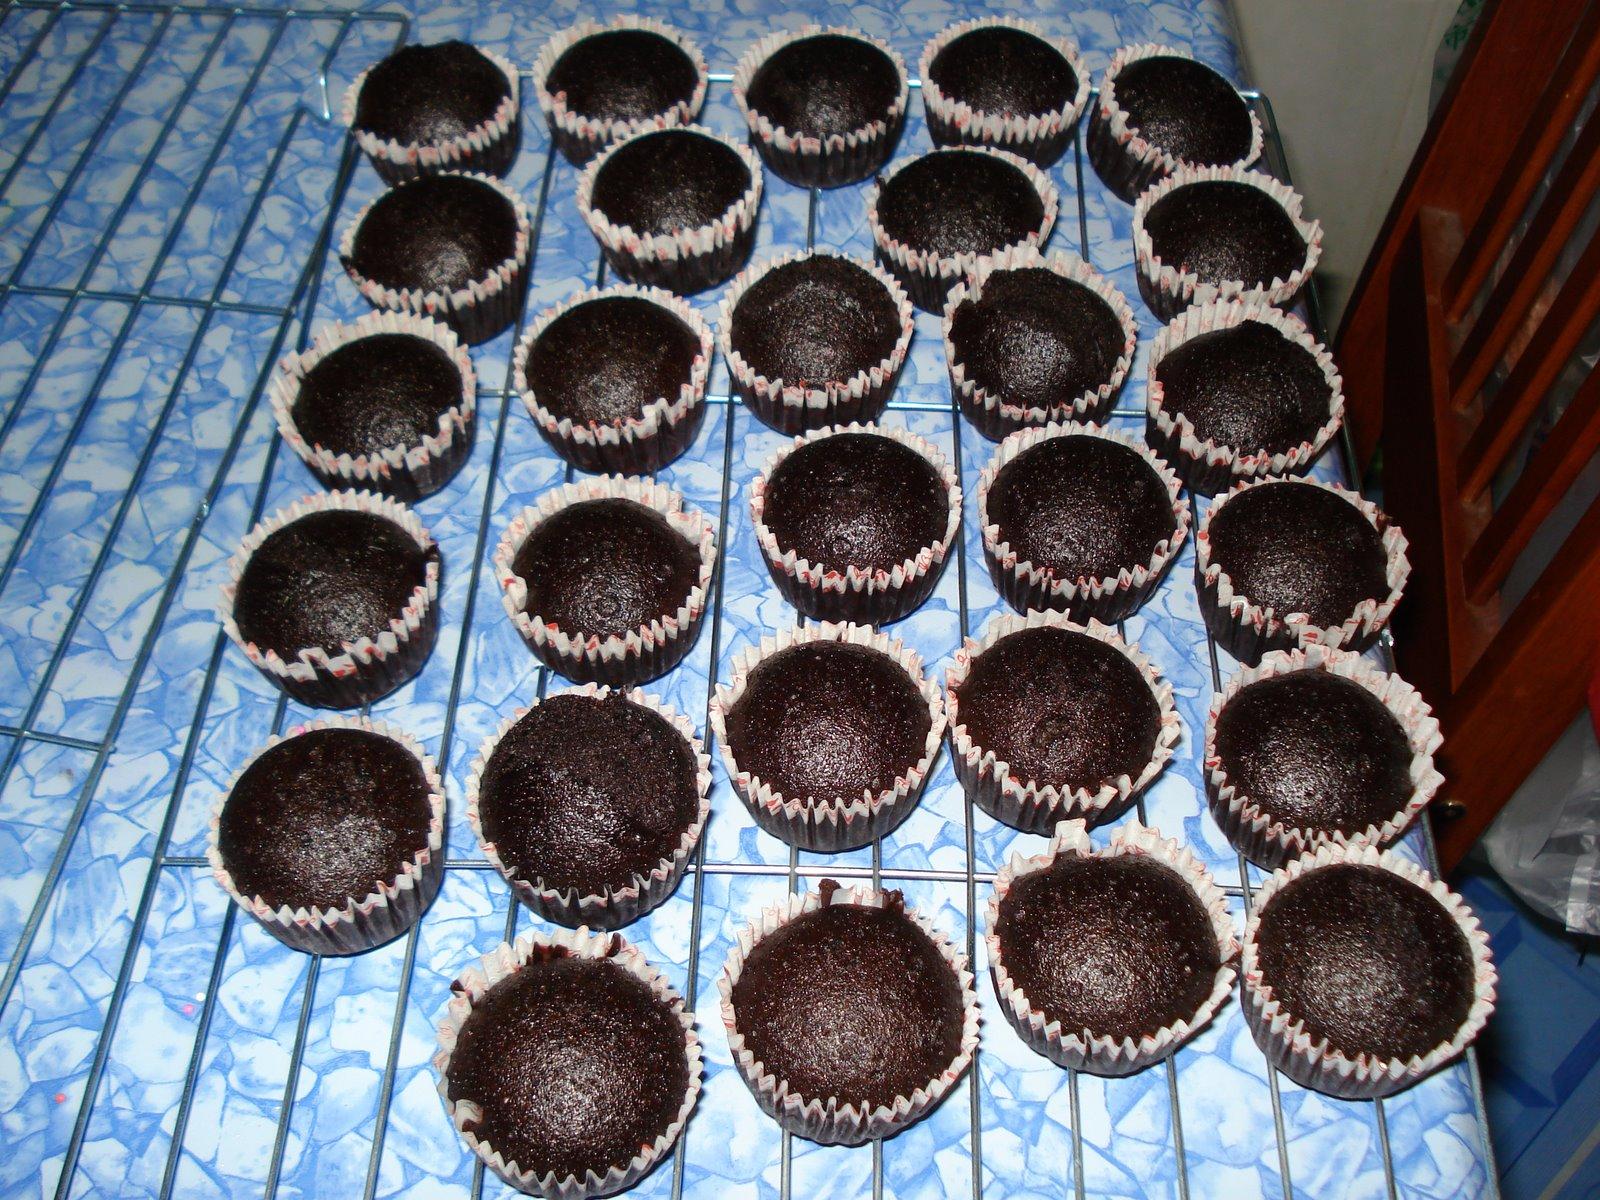 [Coklat+Kukus+Cupcakes+002.jpg]